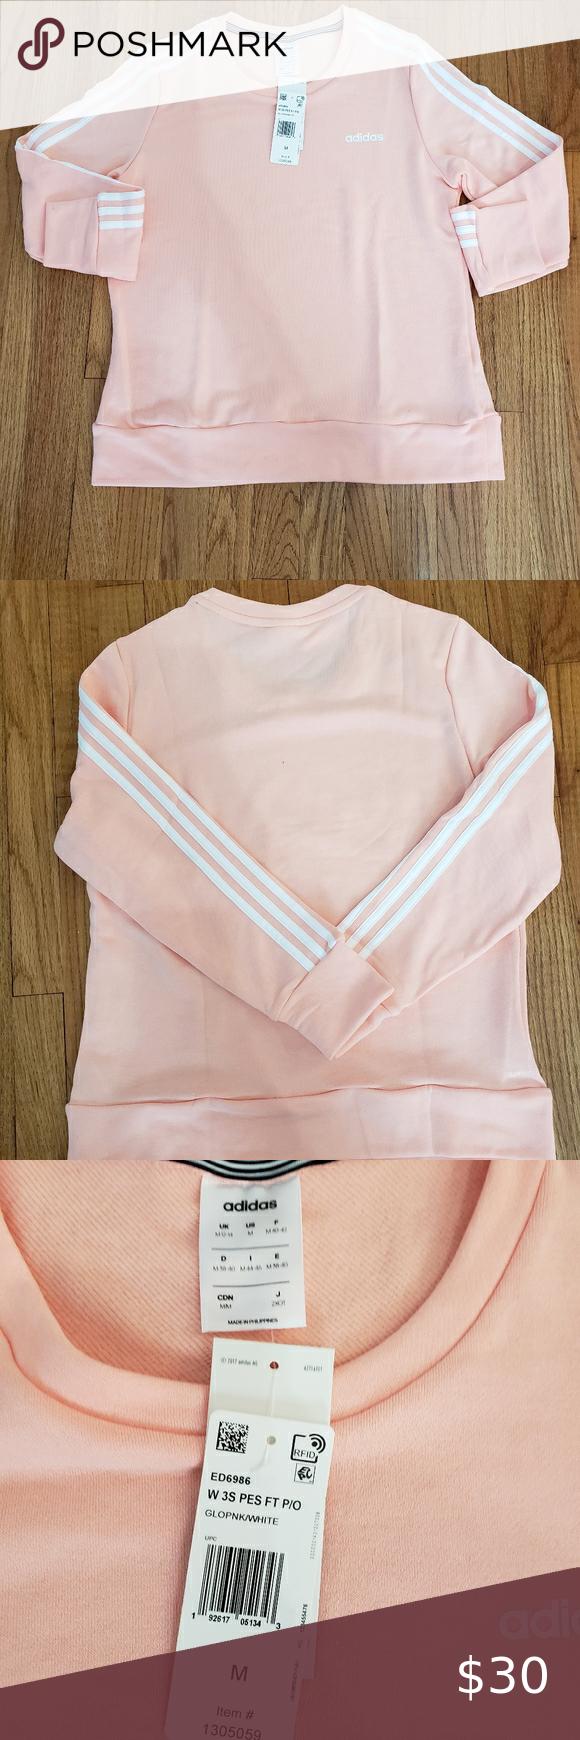 Adidas 3 Stripes Crewneck Sweatshirt Size M Crew Neck Sweatshirt Branded Sweatshirts Sweatshirts [ 1740 x 580 Pixel ]